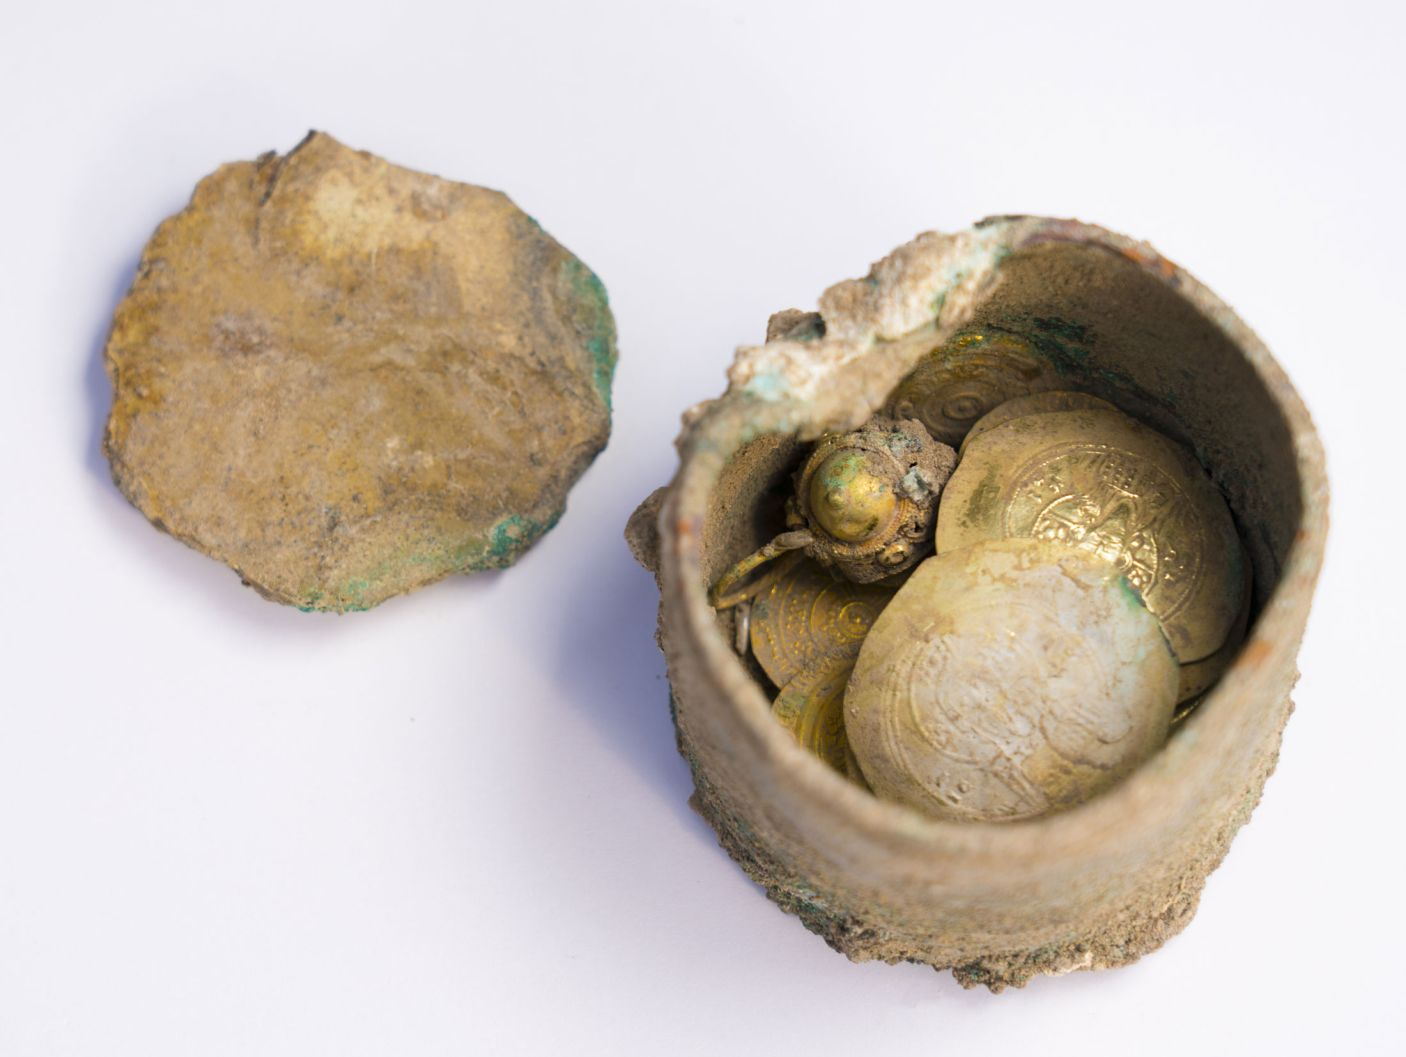 900-year-old treasure hoard discovered in Caesarea Israel.